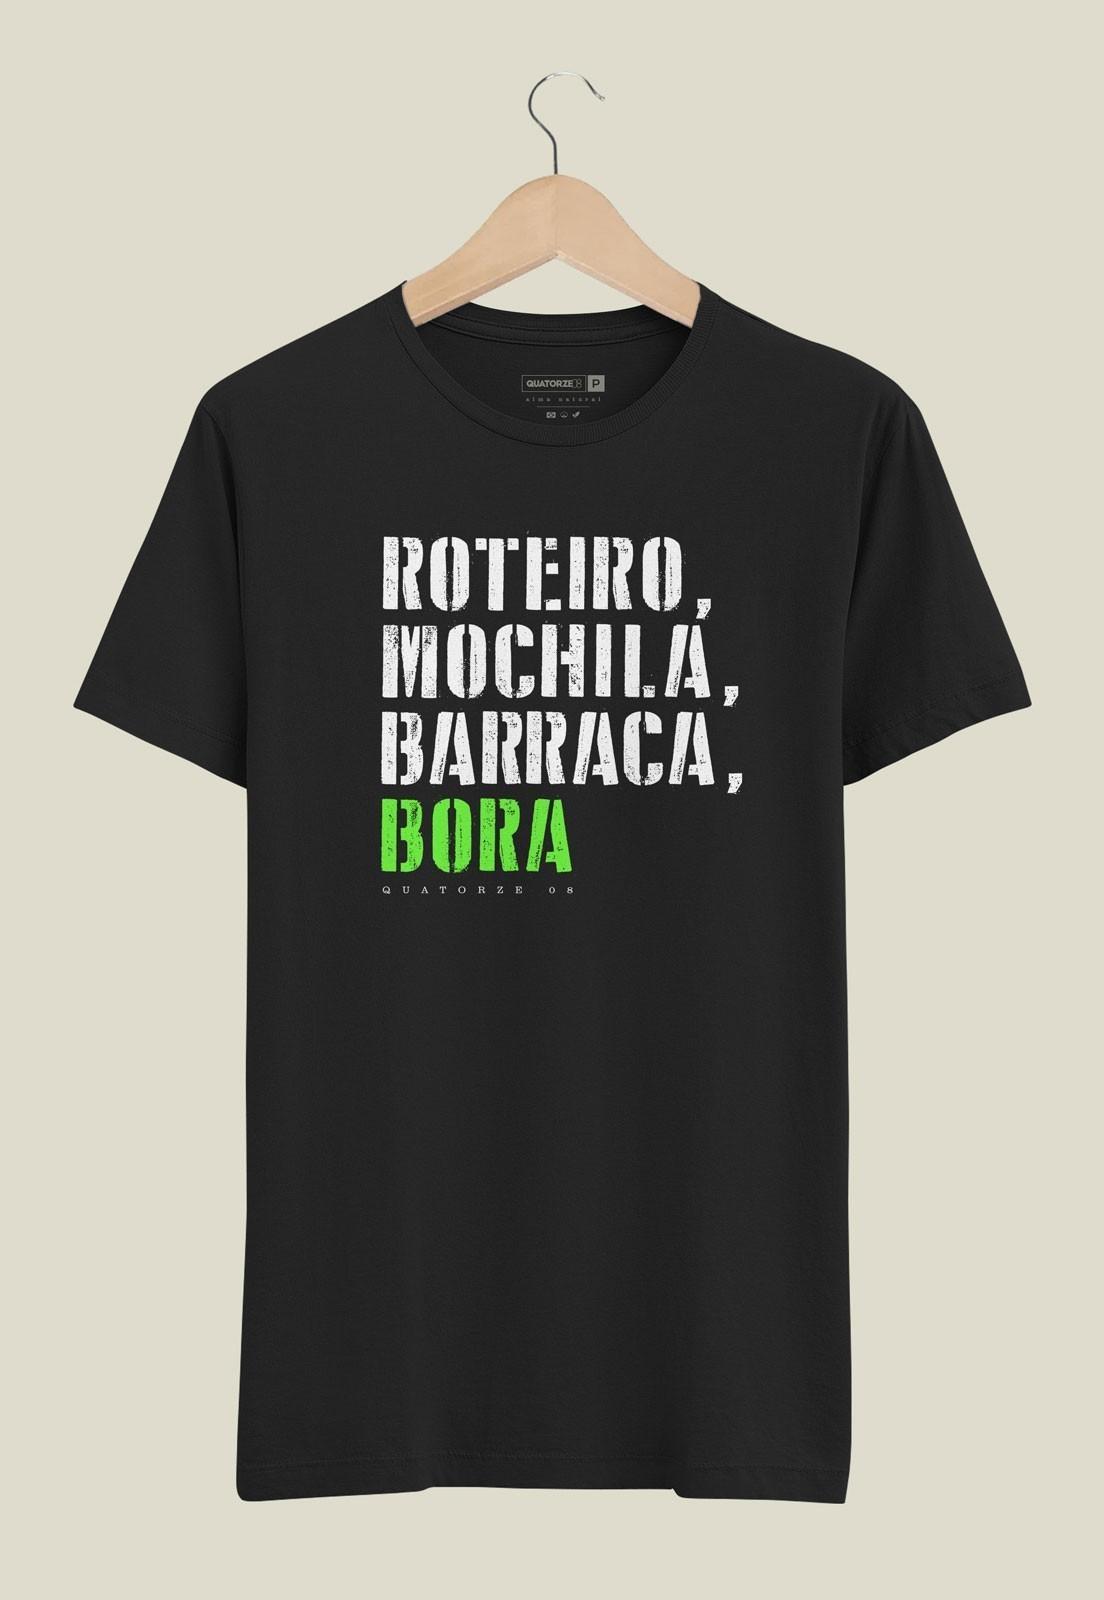 Camiseta Barraca e Bora Preta